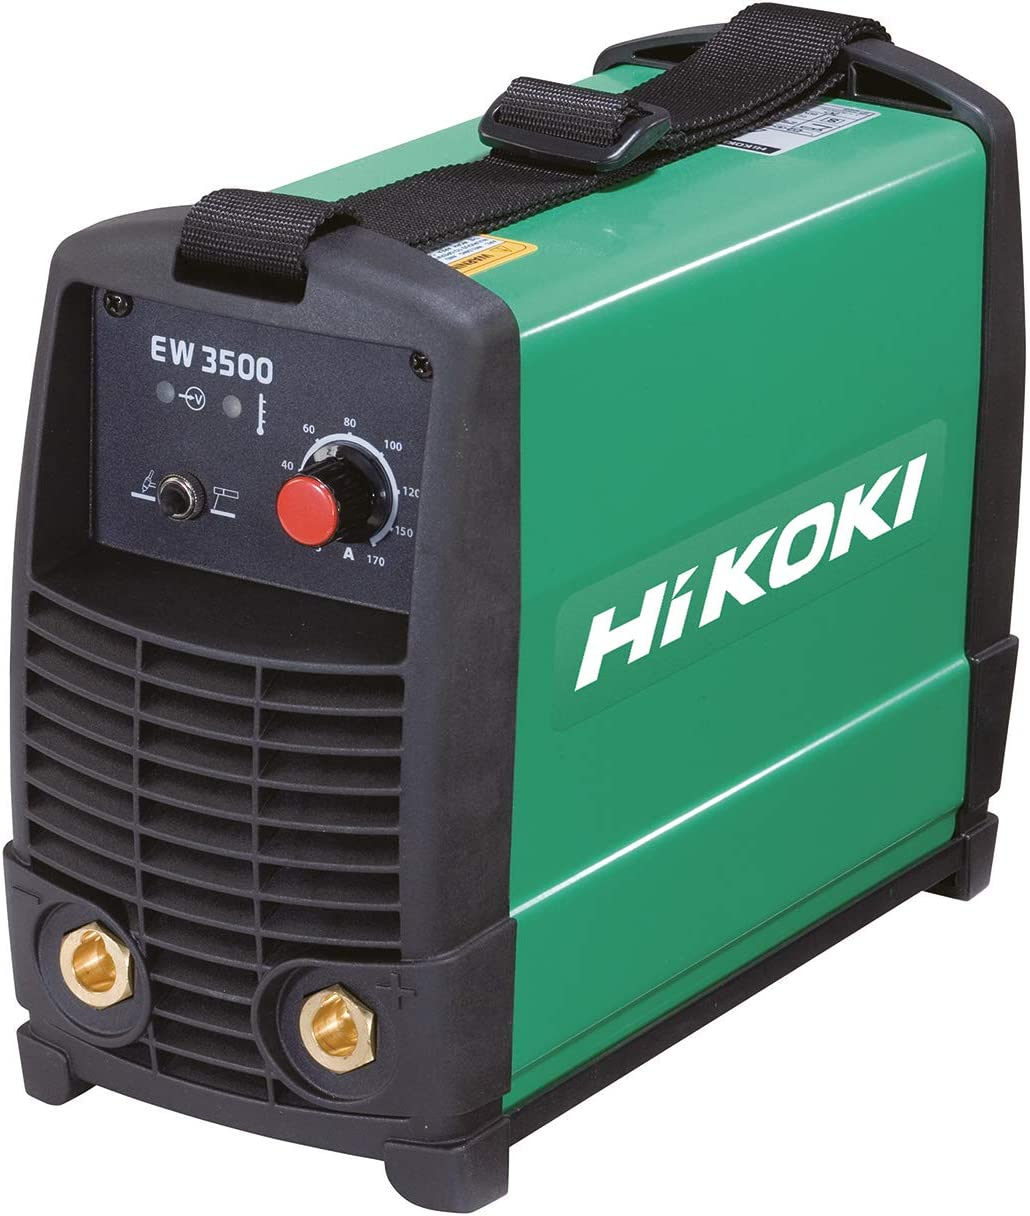 HIKOKI EW3500LA - Soldador Inverter de tipo MMA/TIG 160 A, 230 V